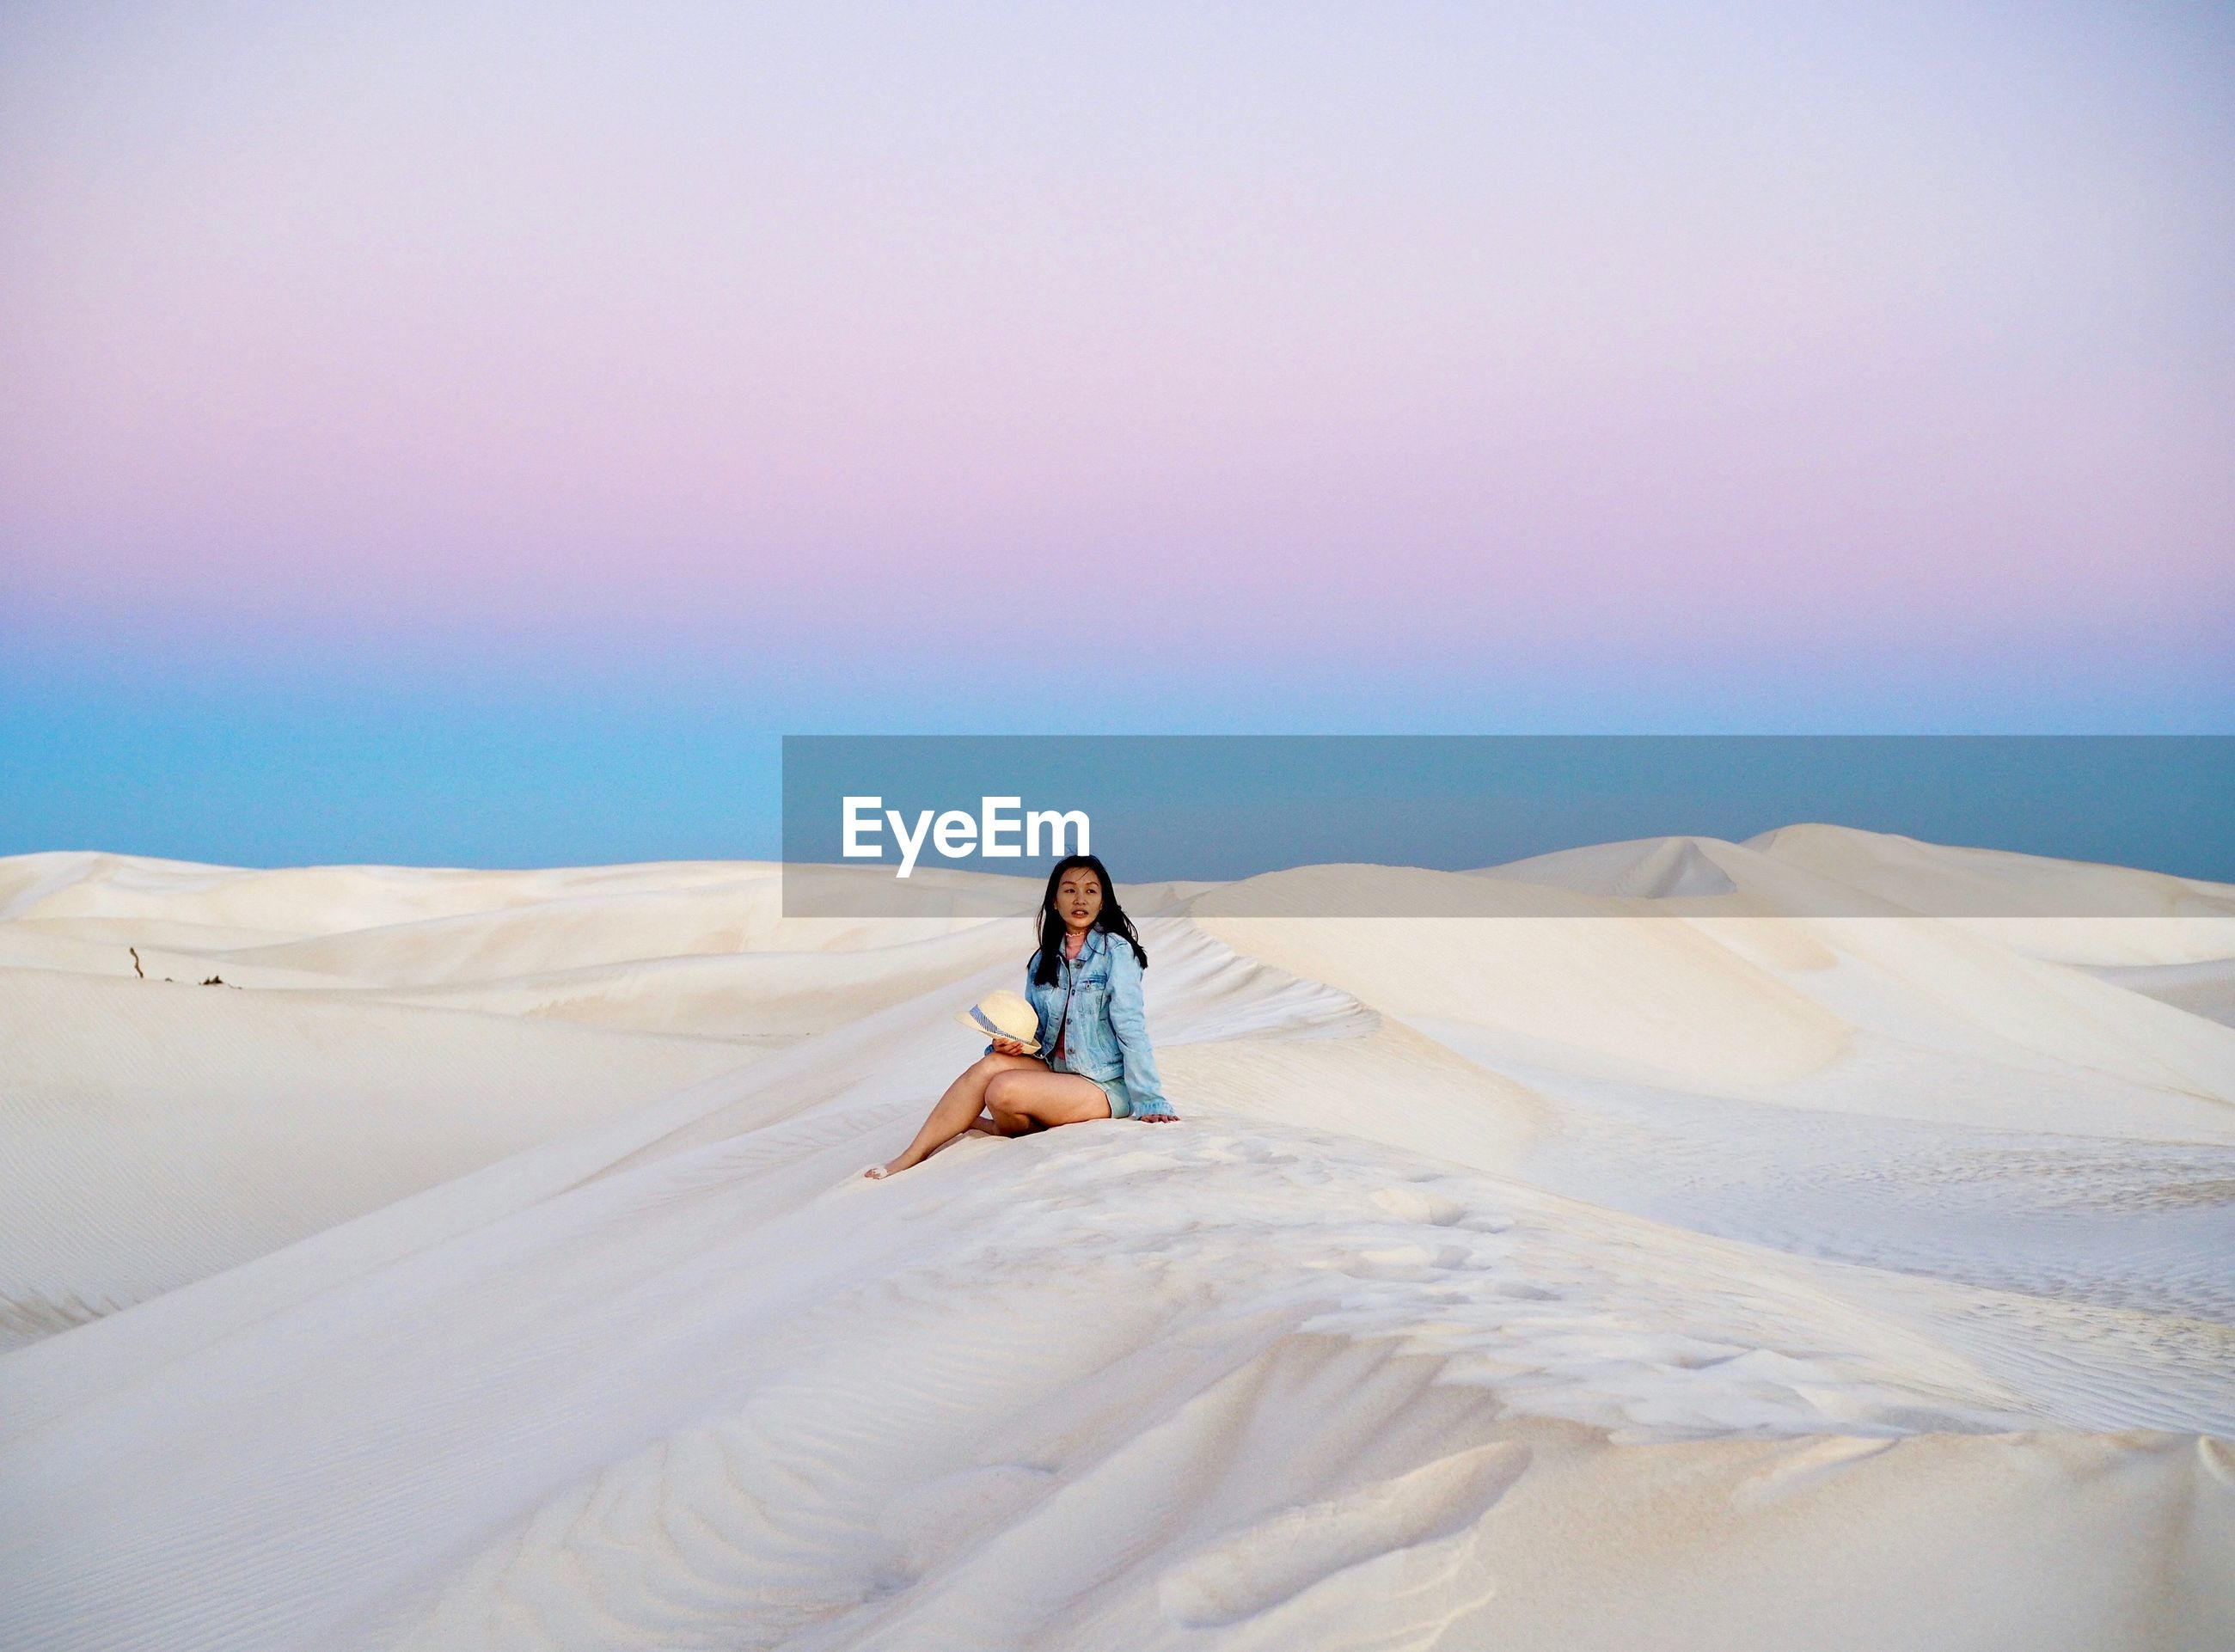 Full length of woman sitting on sand dune against sky during sunset